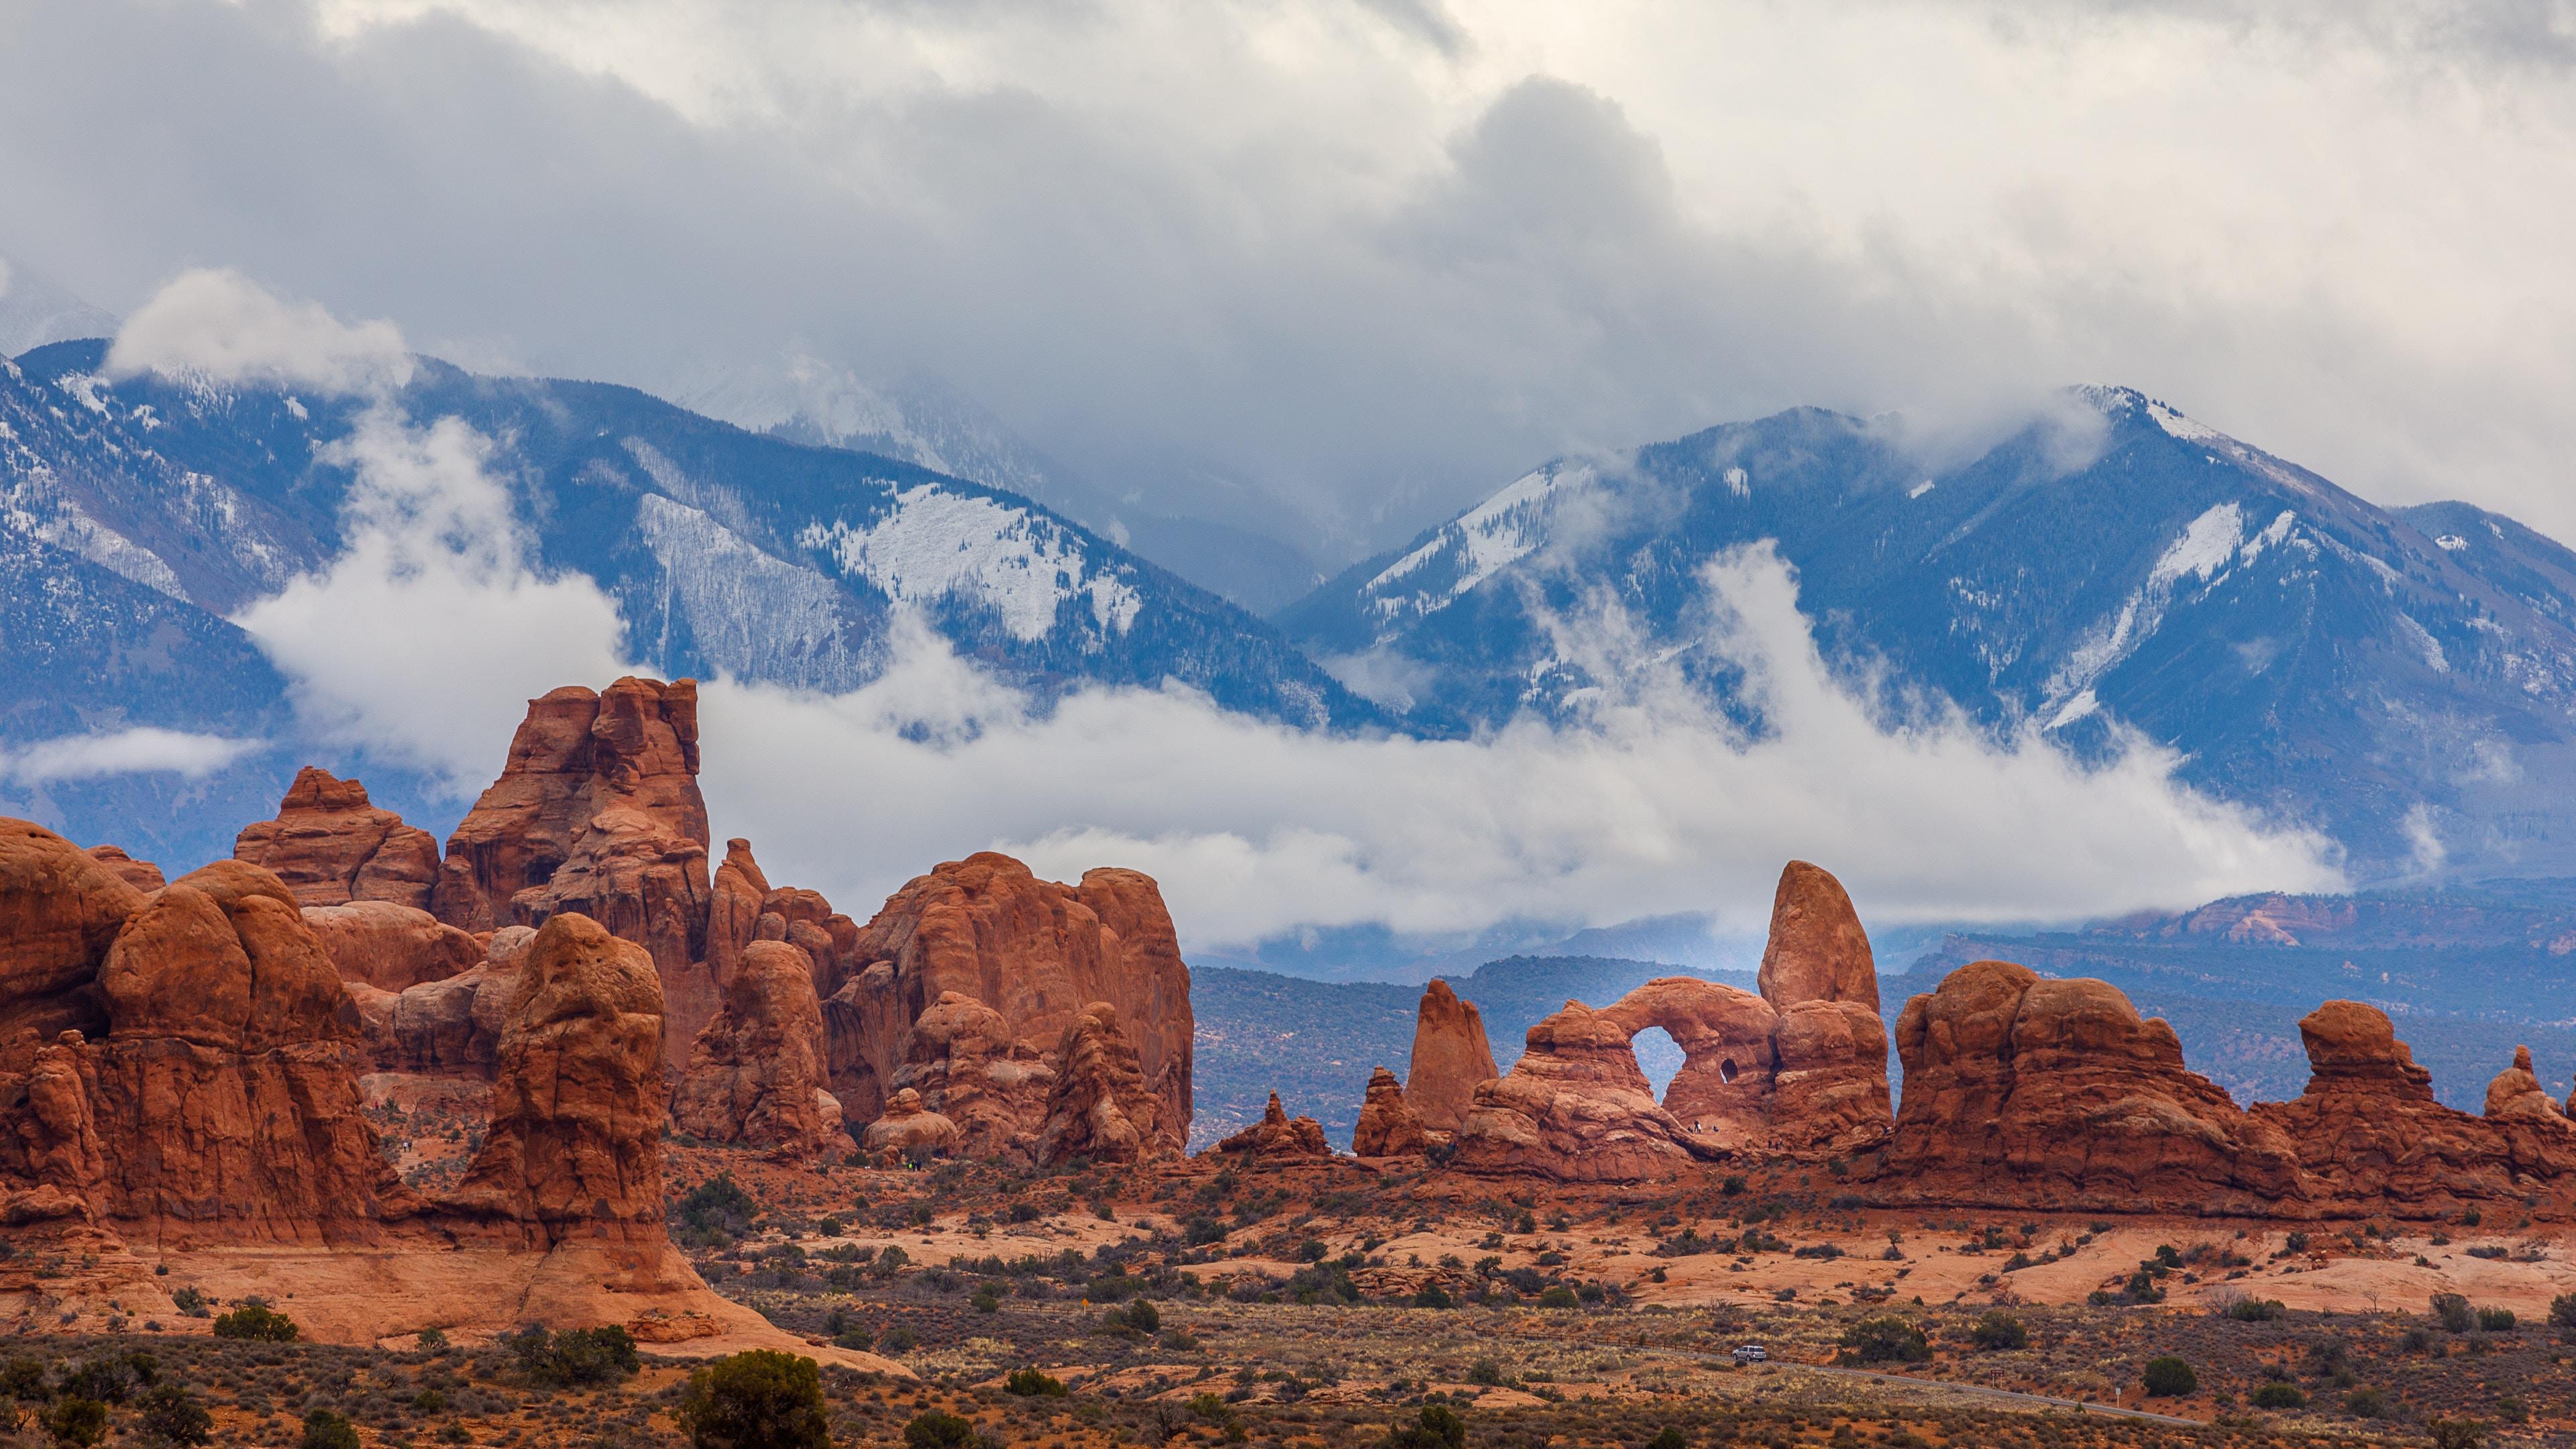 Download Original Resolution Arches National Park